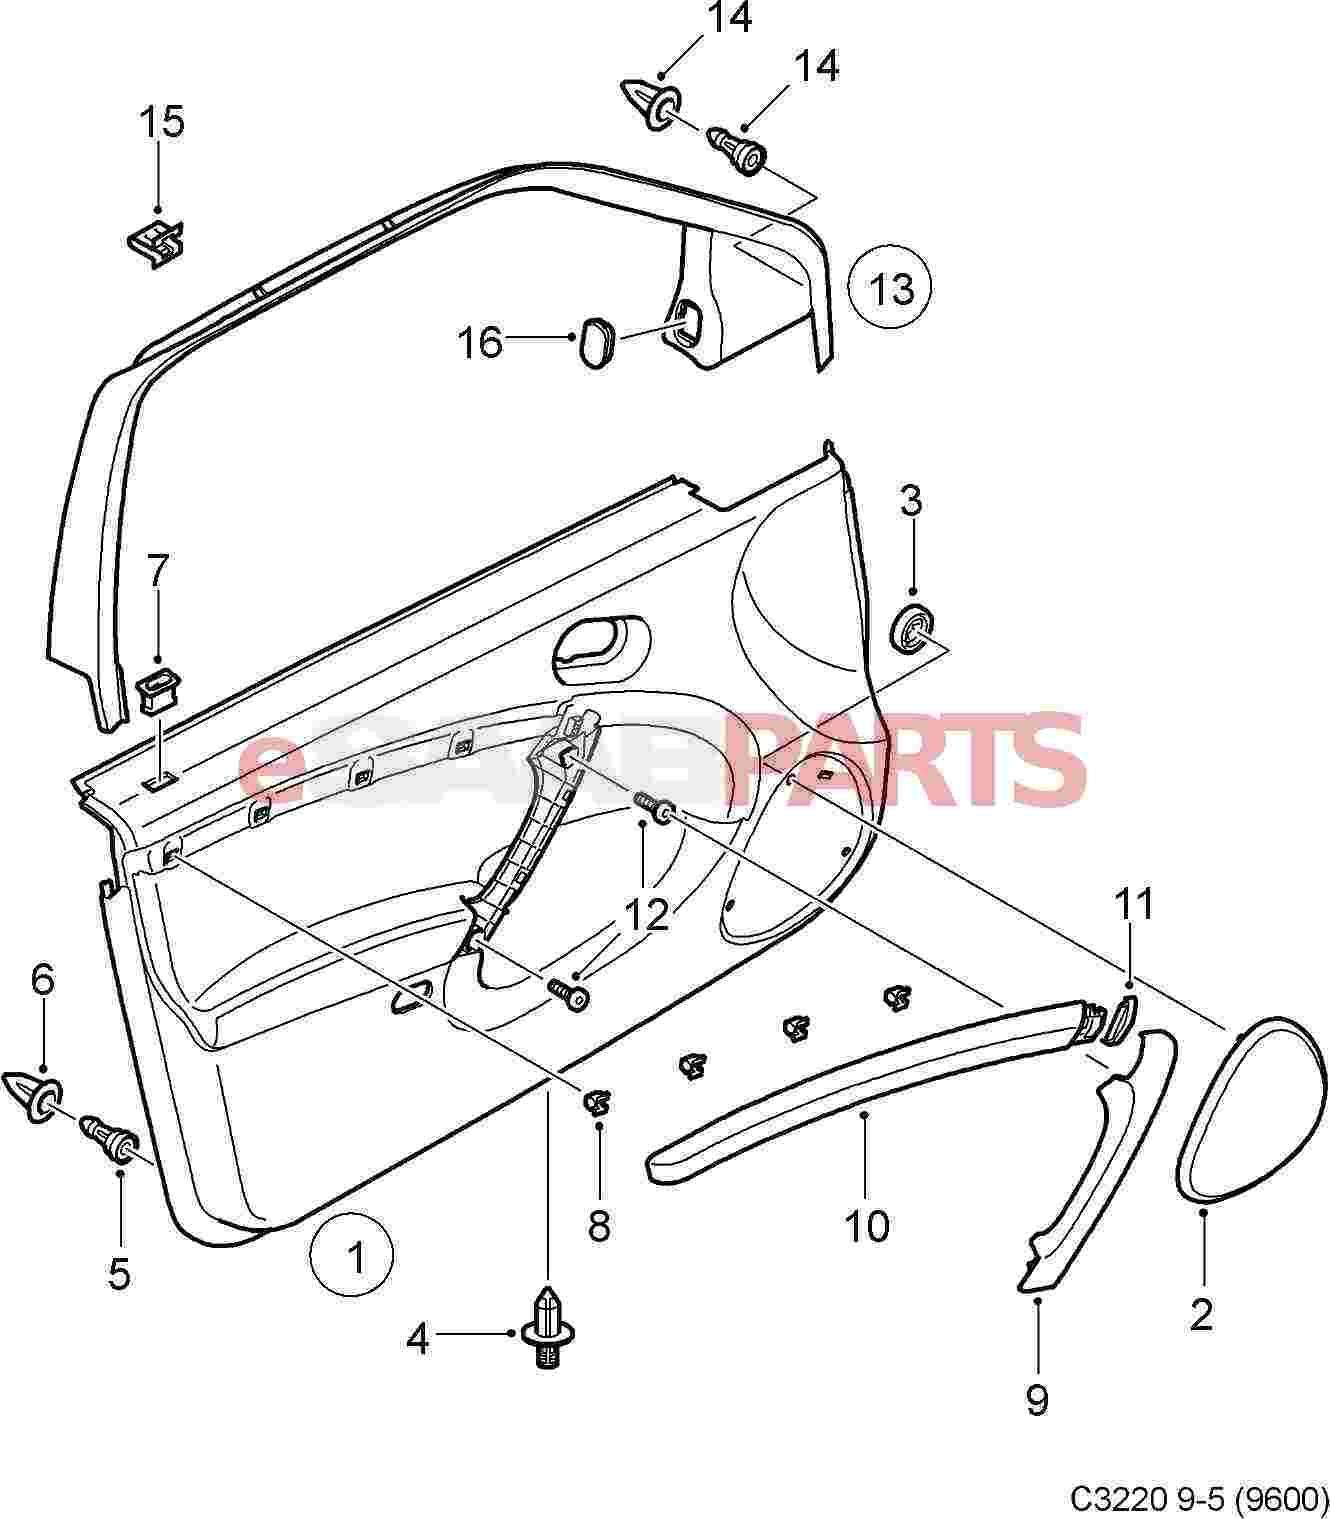 interior auto body parts auto parts drawing at getdrawings com free rh theyodeler org Fuel Gauge Diagram Fuel Gauge Diagram